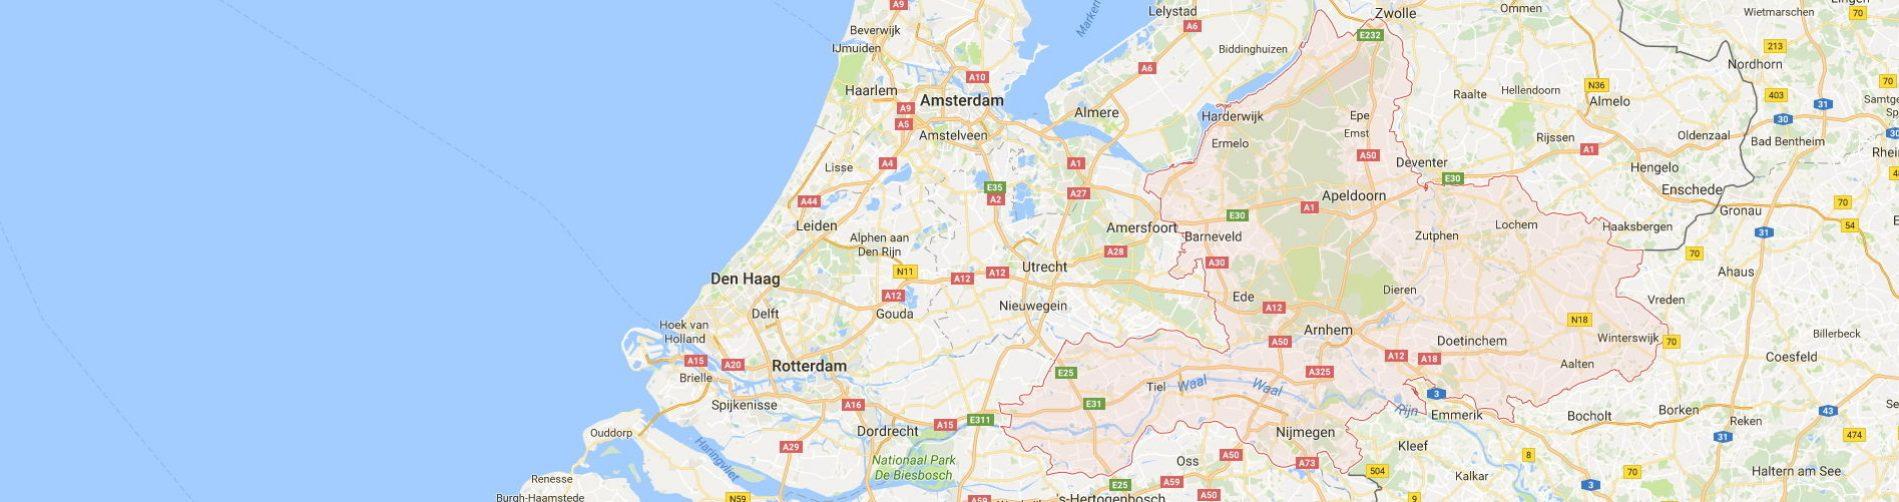 particuliere thuiszorg in de provincie gelderland